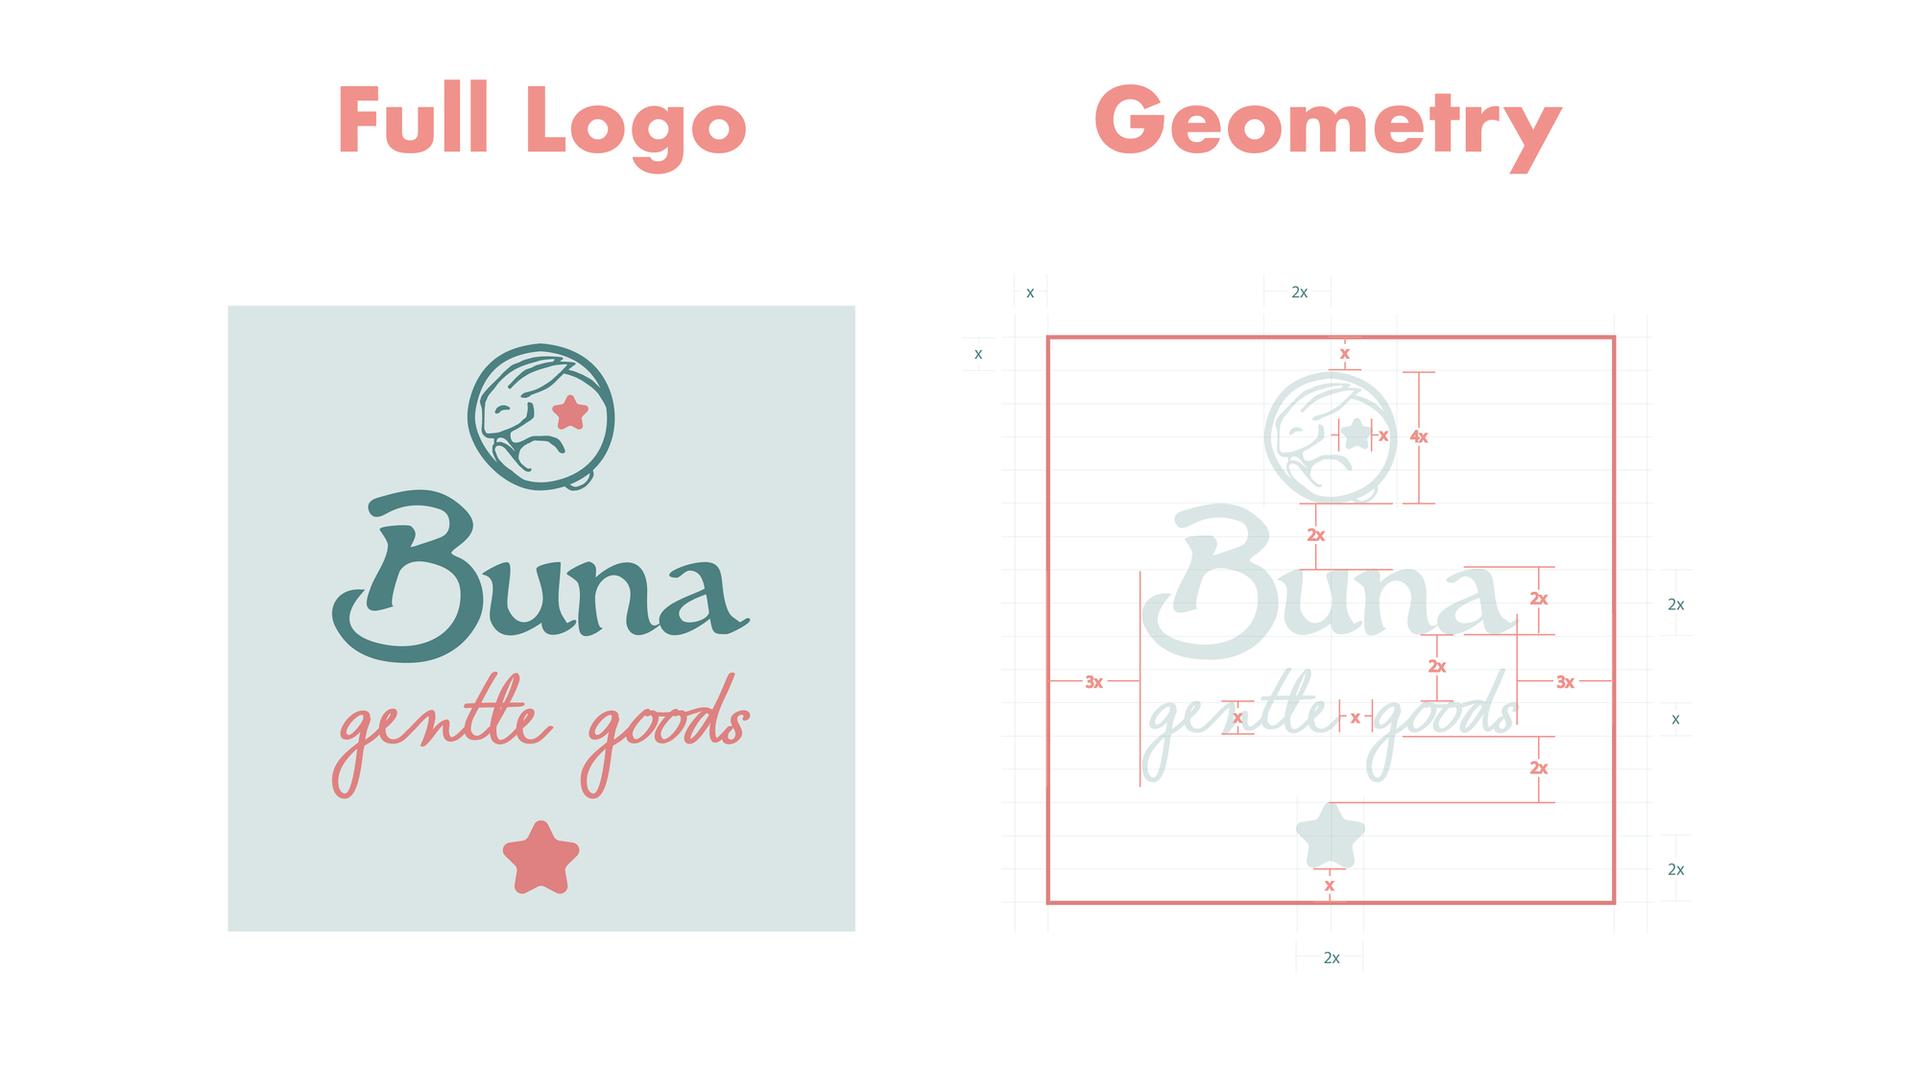 Full Logo and Metrics